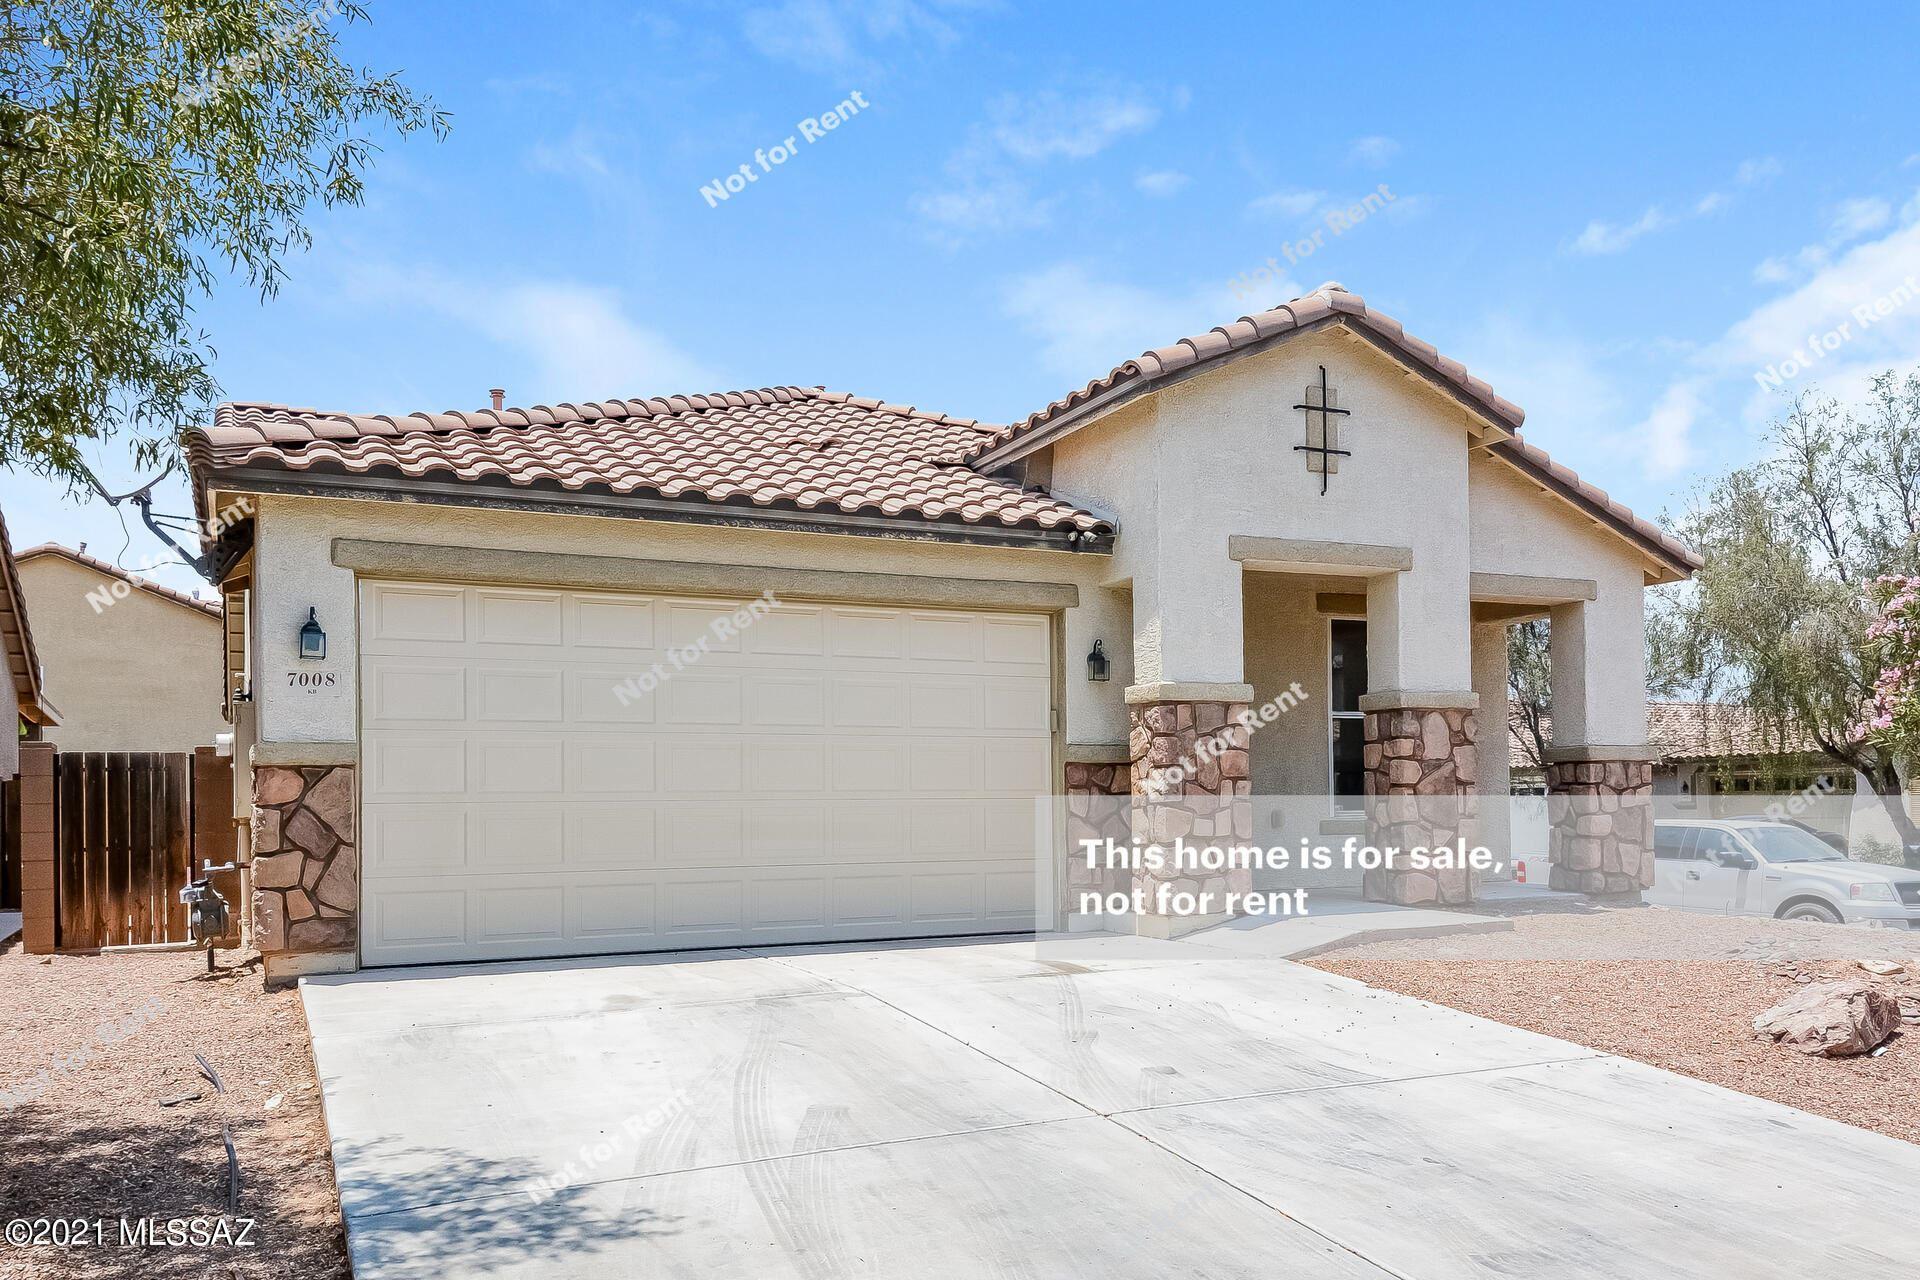 7008 S Beavertail Lane, Tucson, AZ 85756 - MLS#: 22116301